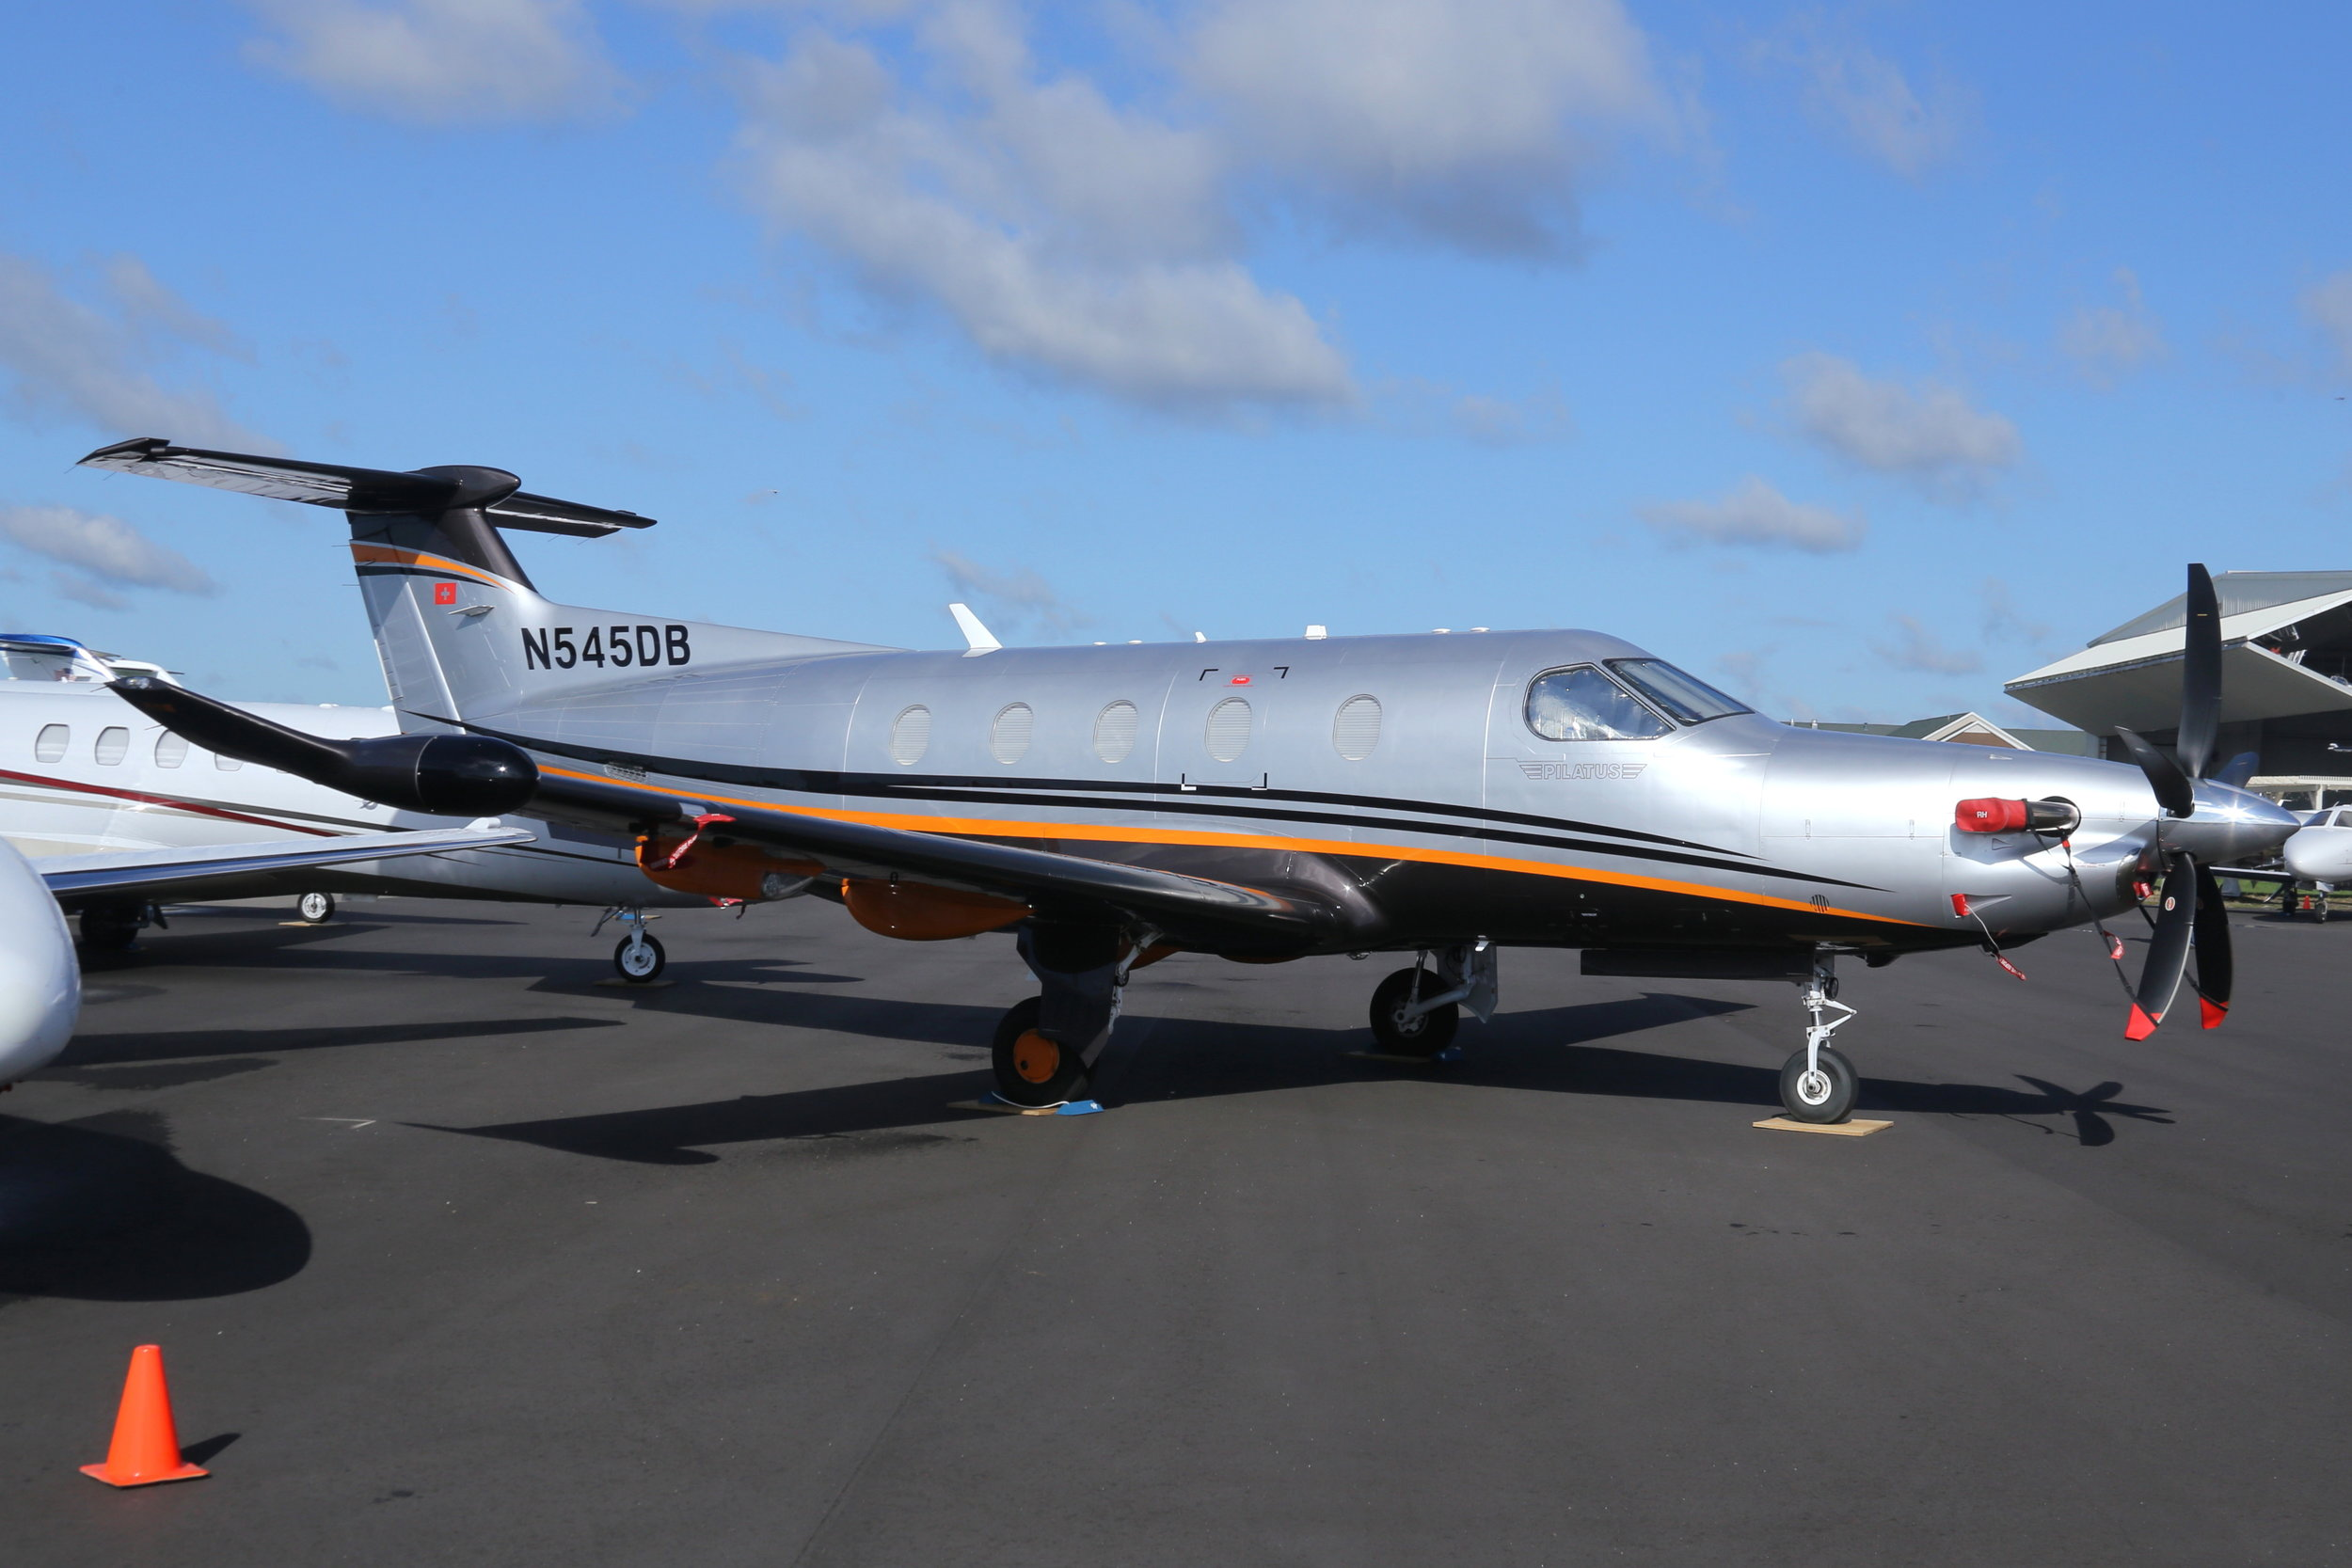 N545DB Pilatus Business Co. PC12 taken at Whitman Regional Airport 26th July 2018 by John Wood